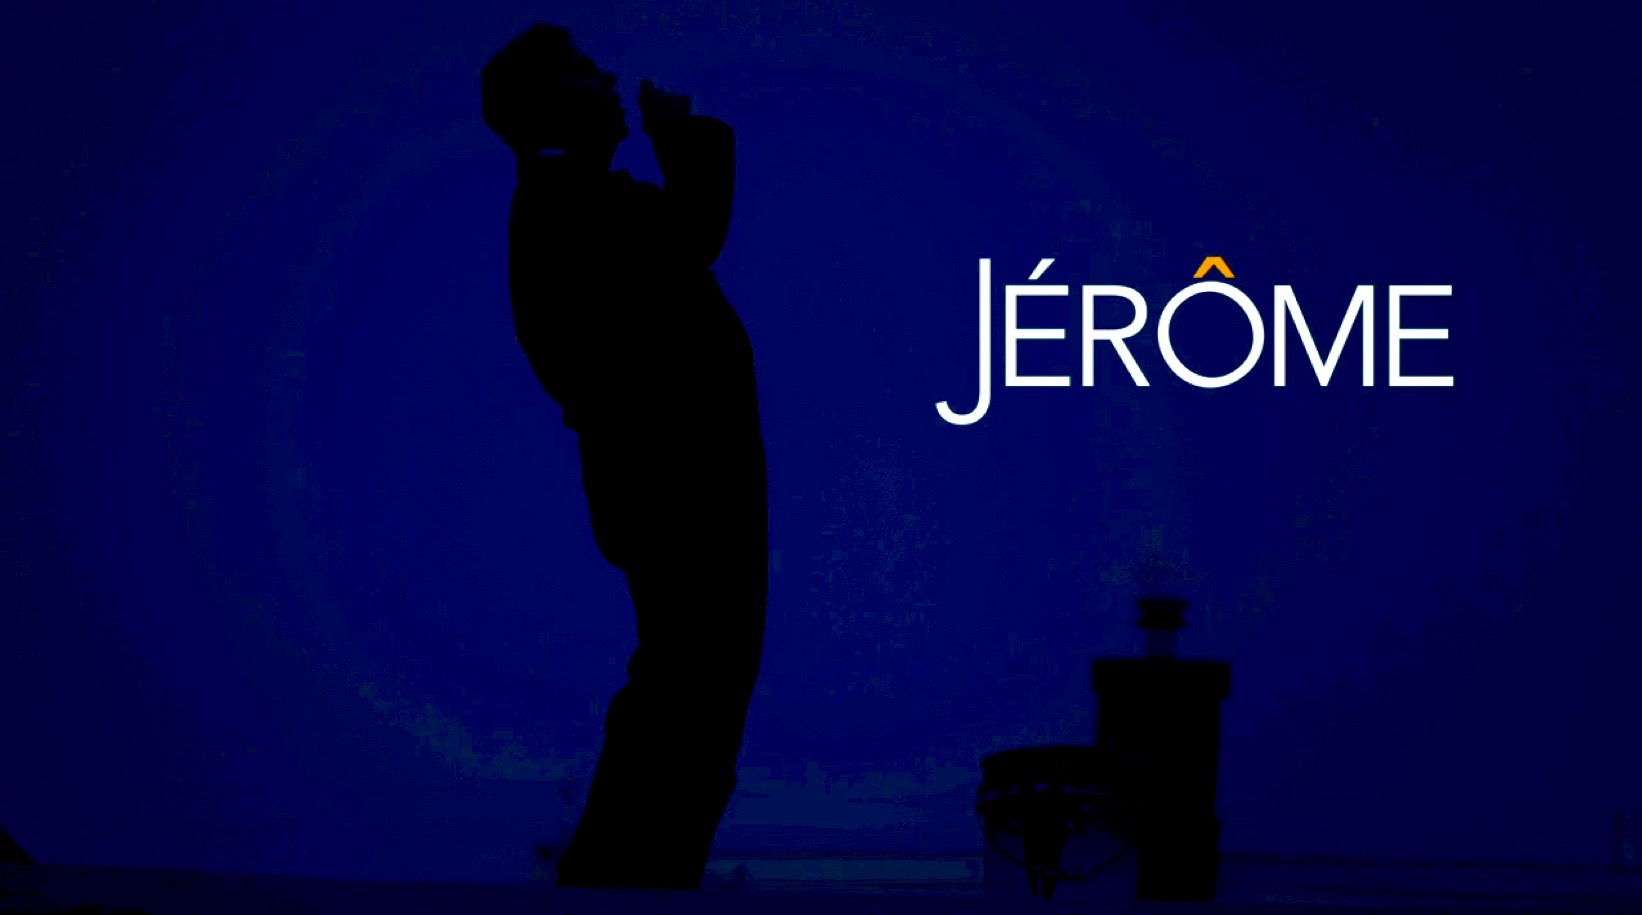 Jerome pic3.jpg